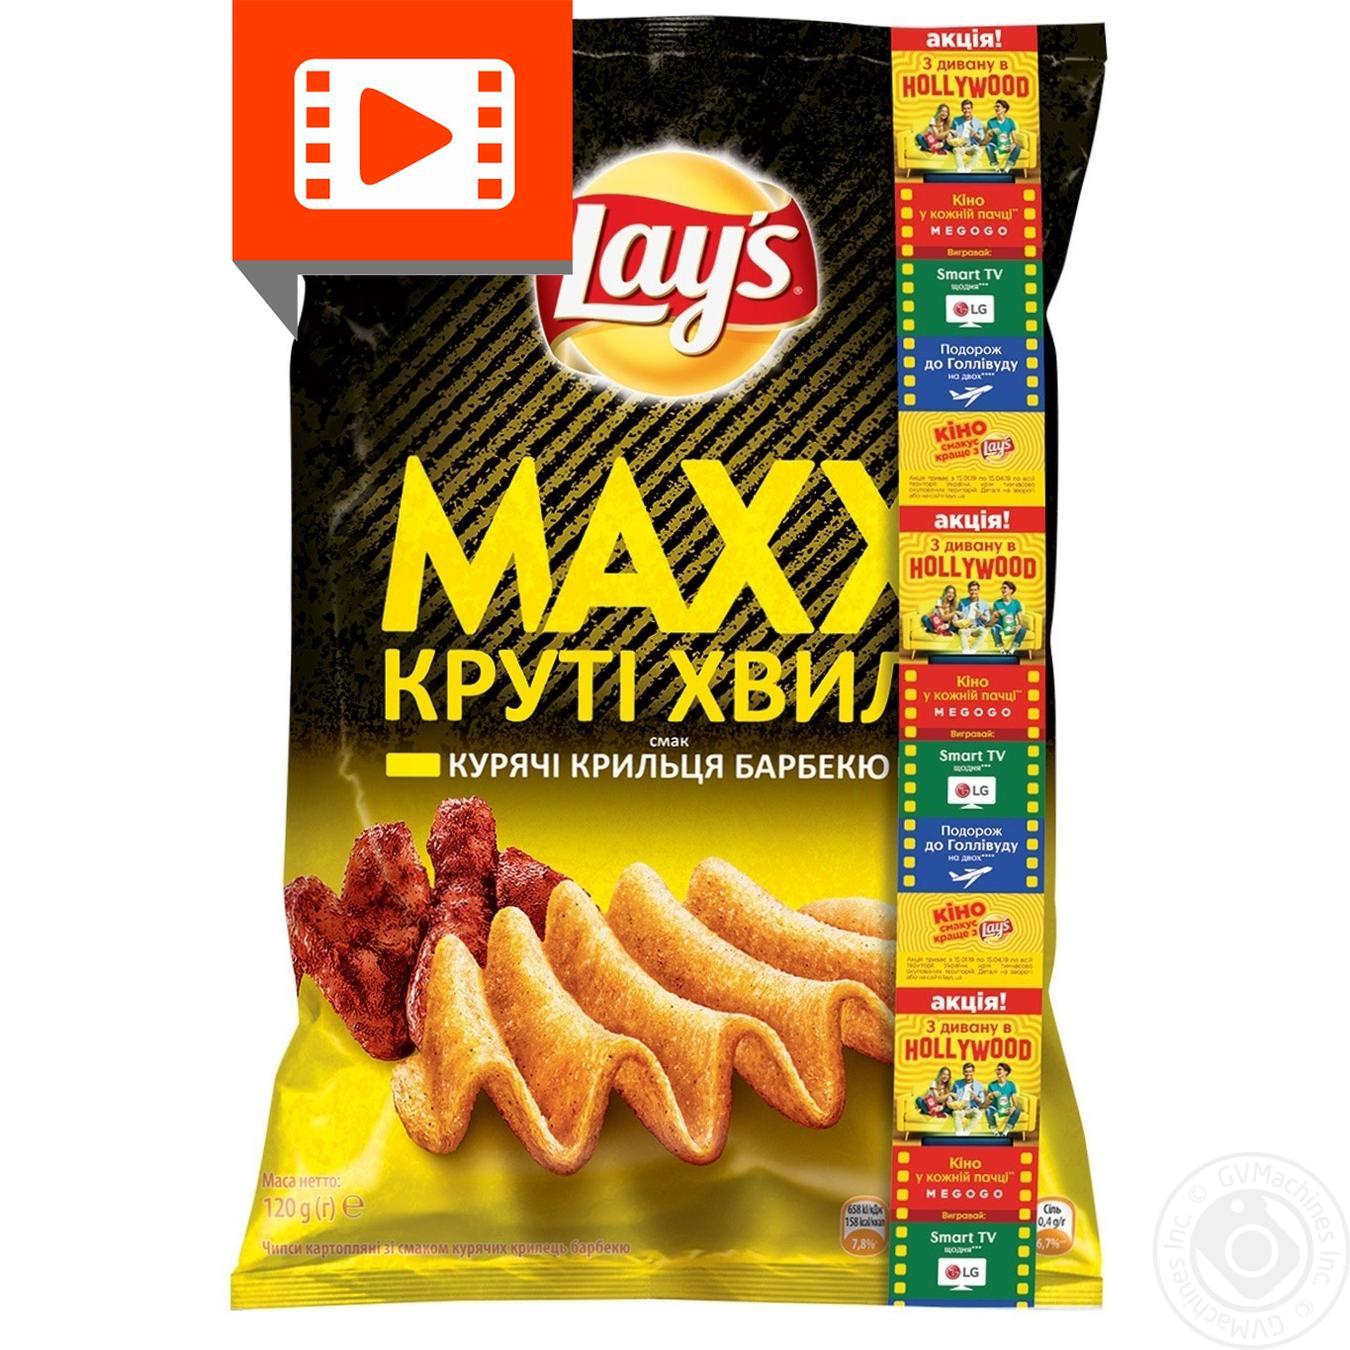 Чипси Lay's Maxx зі смаком курячих крилець барбекю 120г